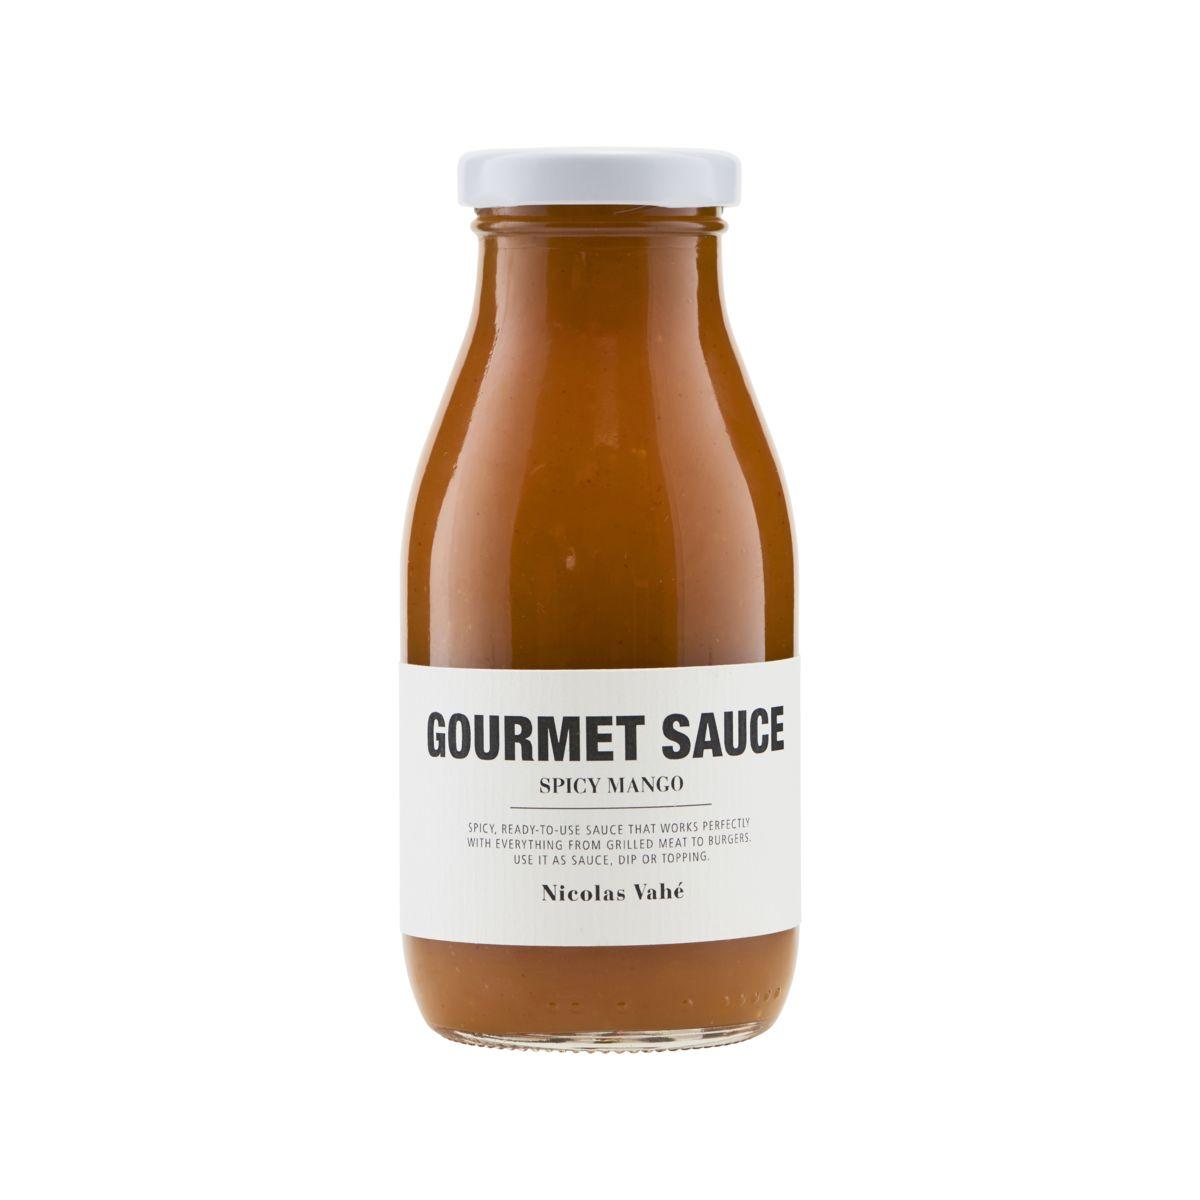 Salsa Gourmet - Spicy Mango - Nicolas Vahe- regalo foodie - navidad - Liderlamp (1)